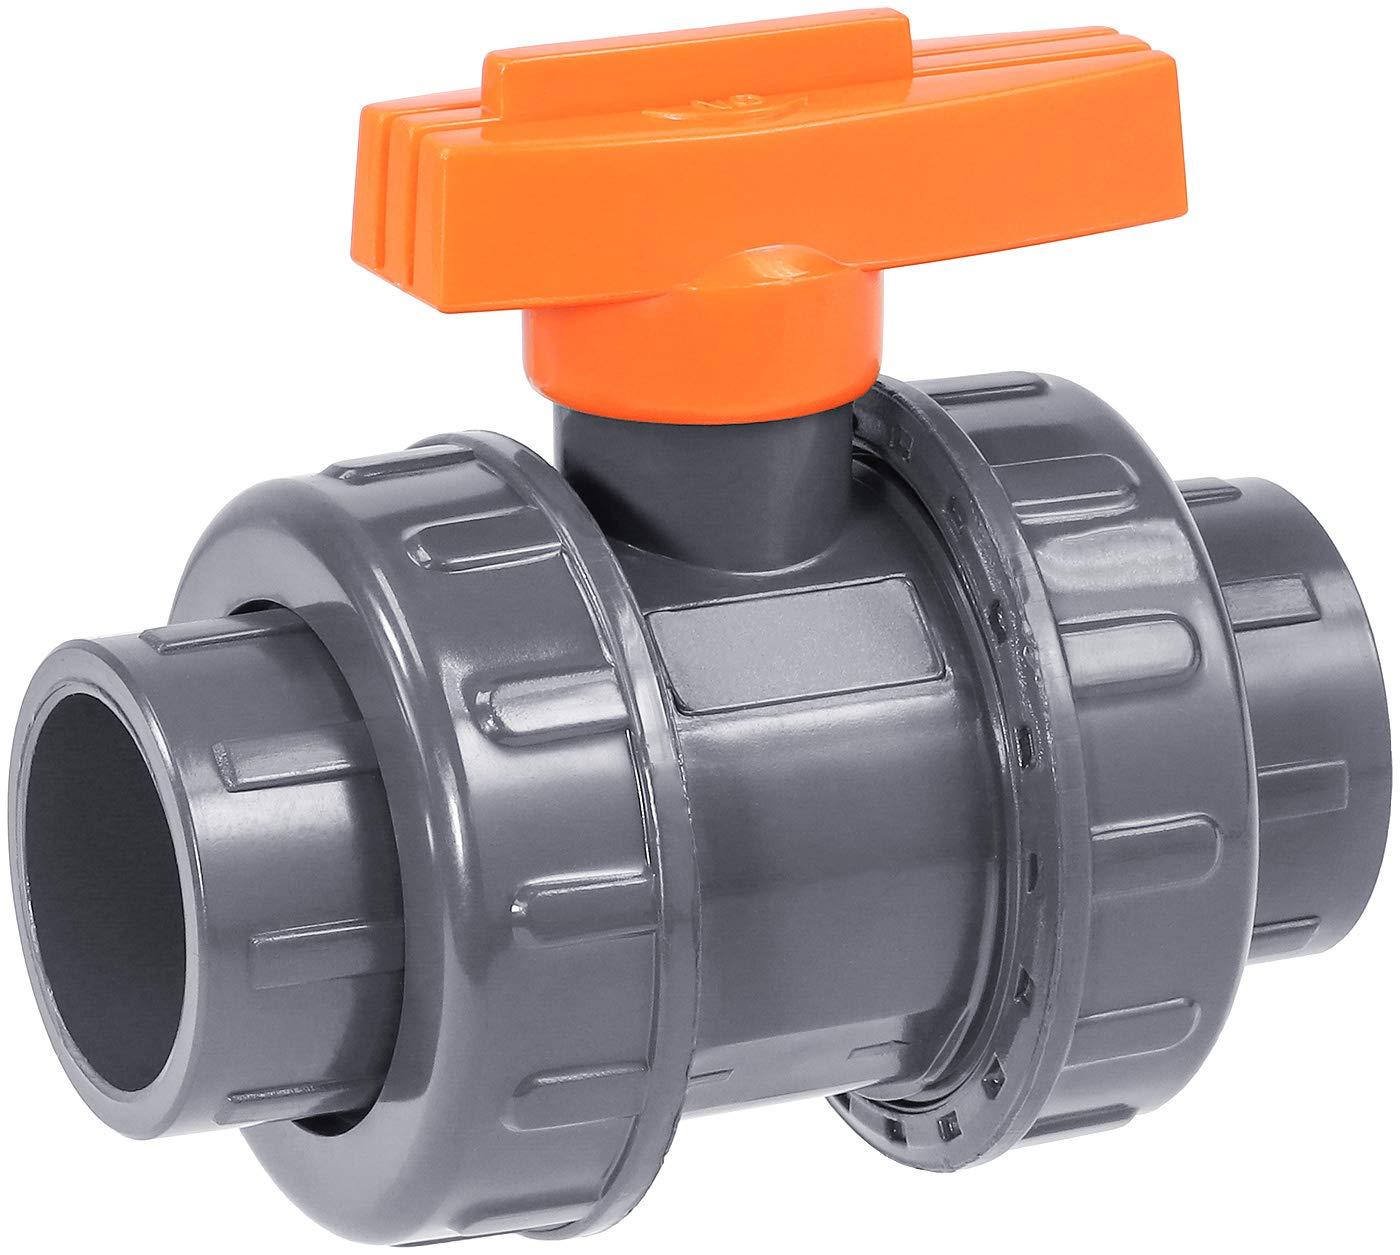 IrrigationKing RKBV1O Double Union PVC Weld Valve Sale SALE% OFF Sales Ball 1